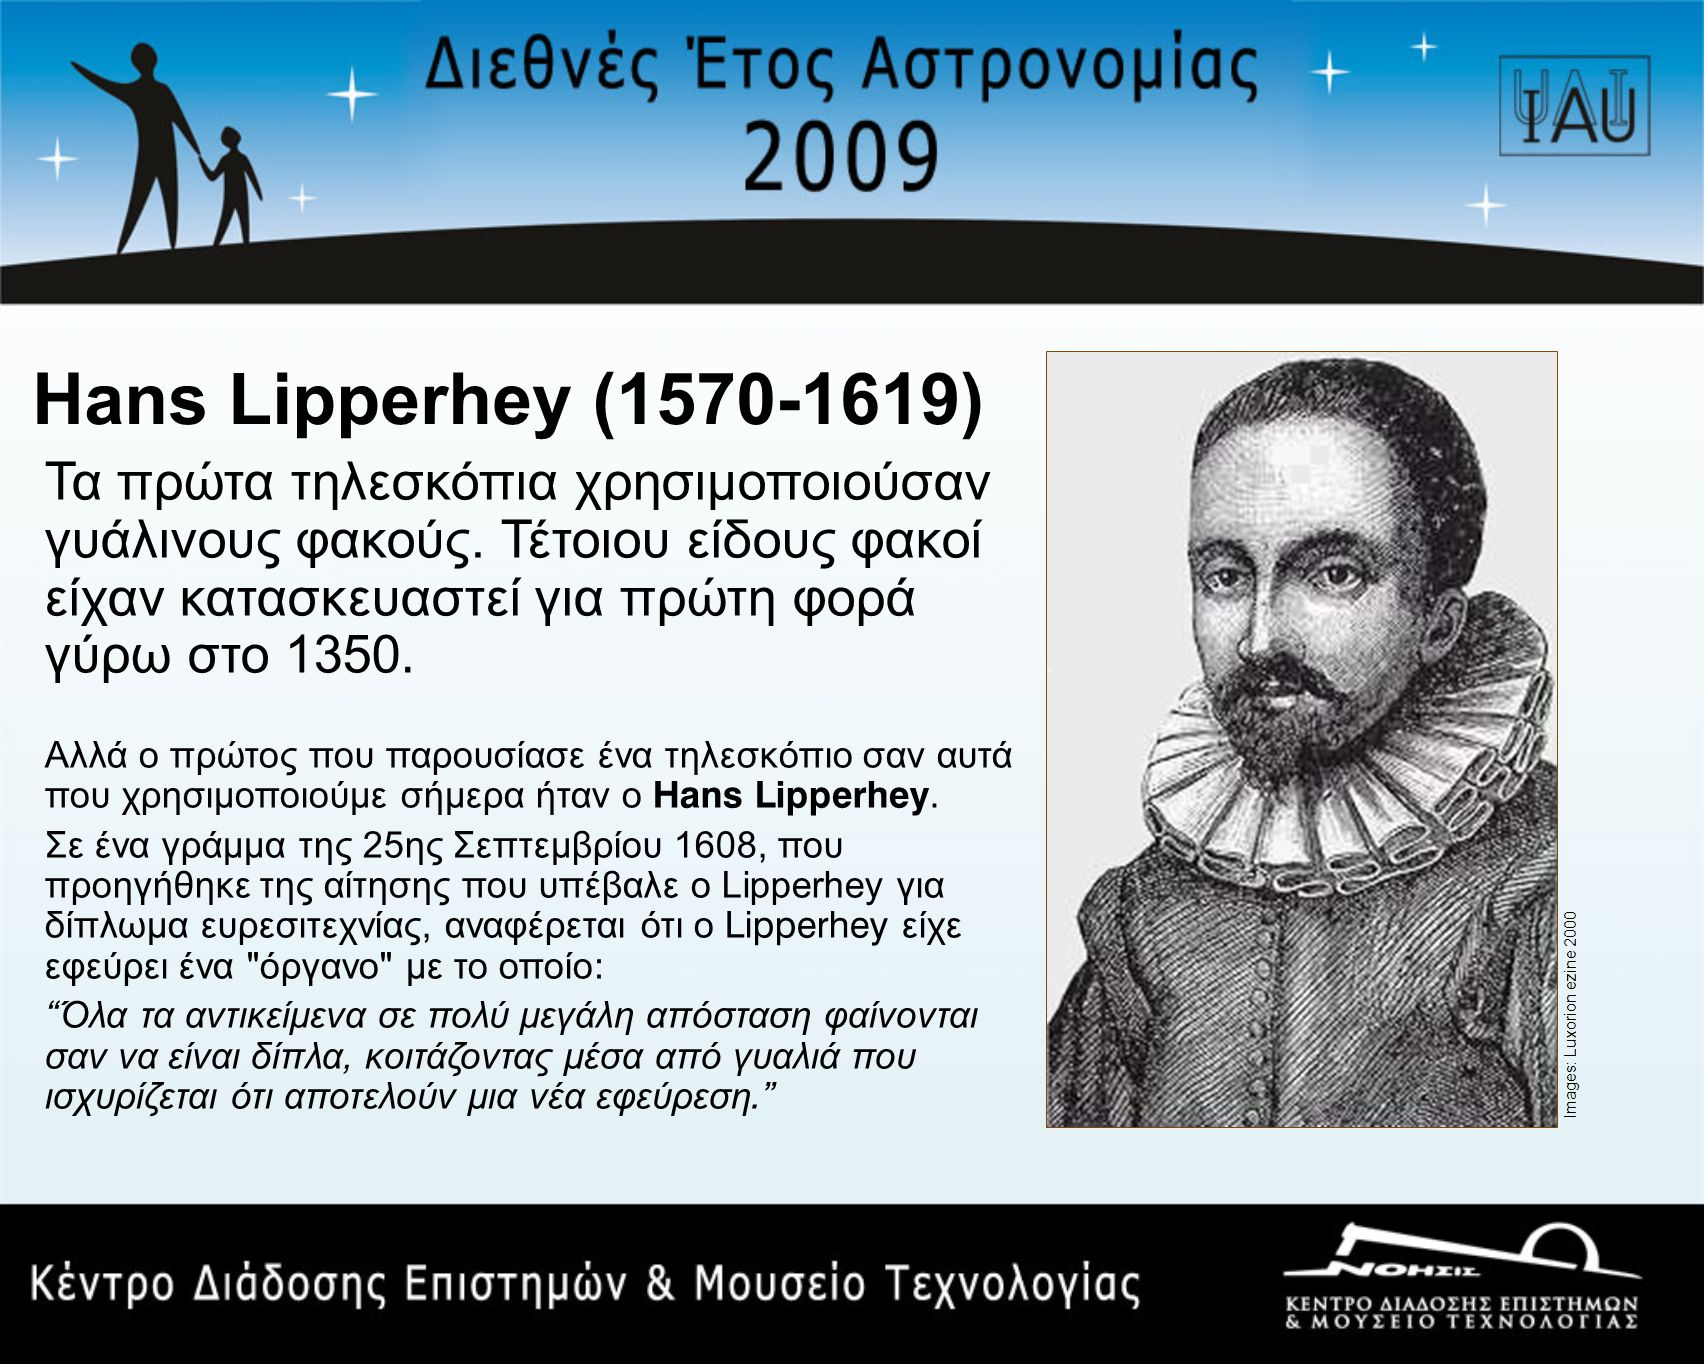 Hans Lipperhey (1570-1619)